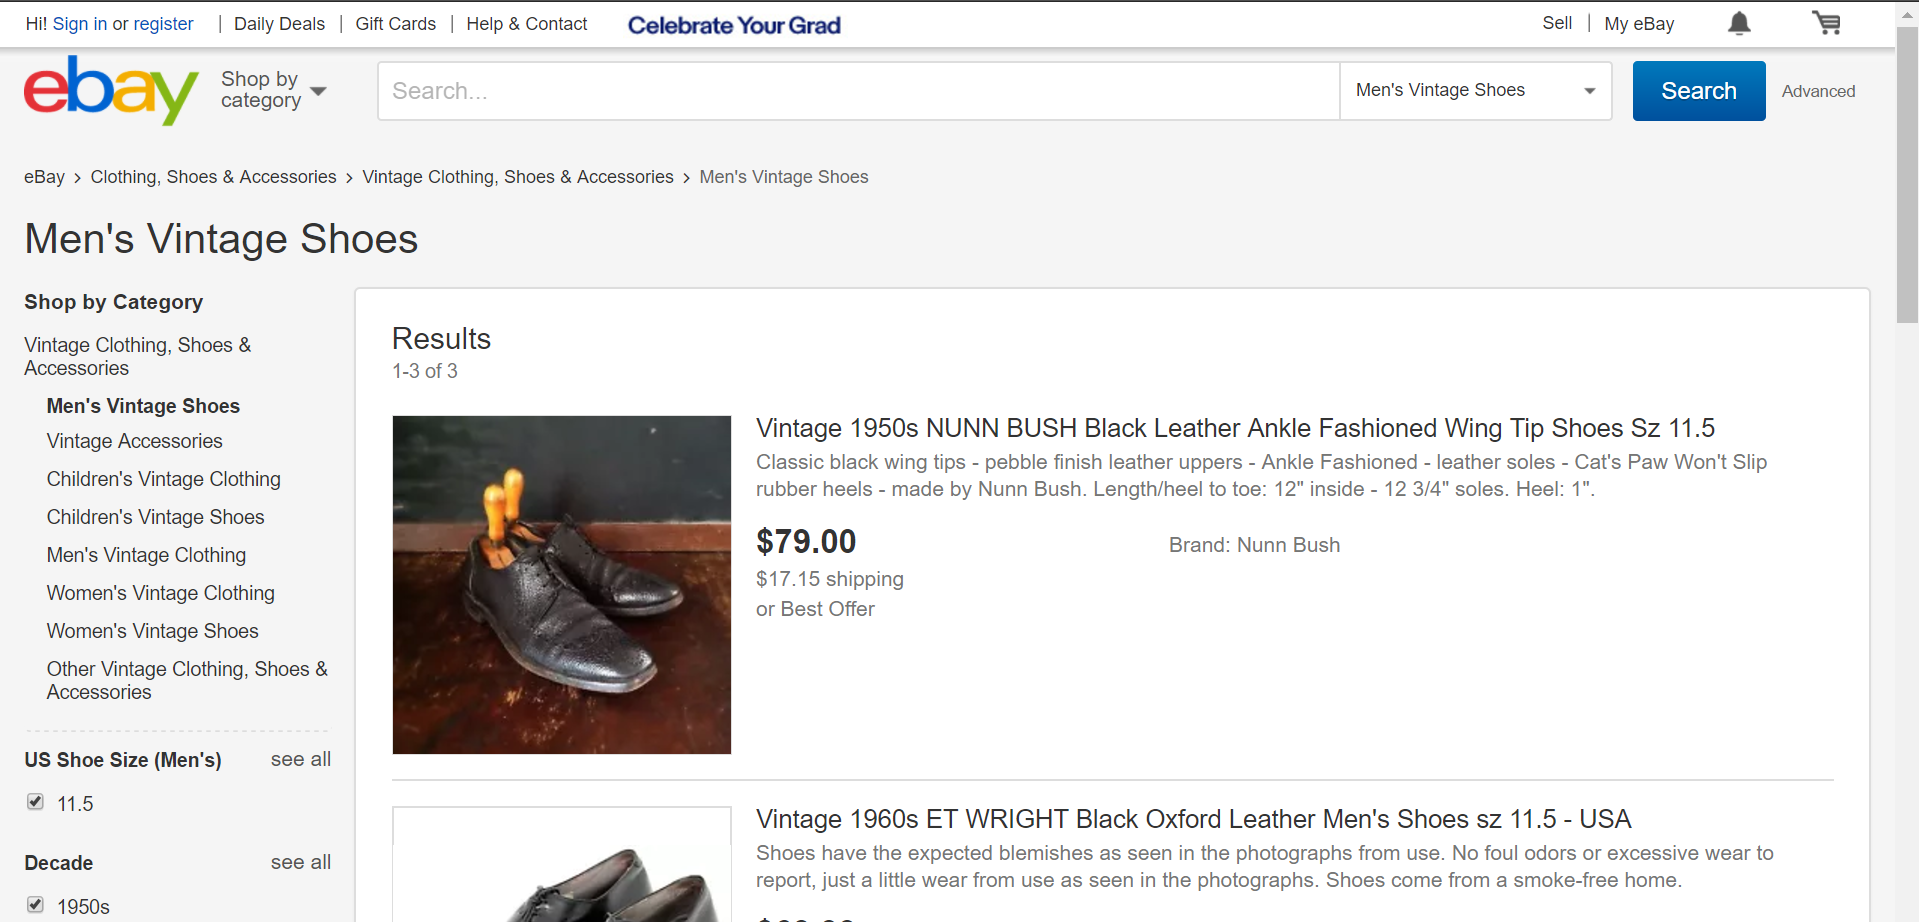 eBay UI